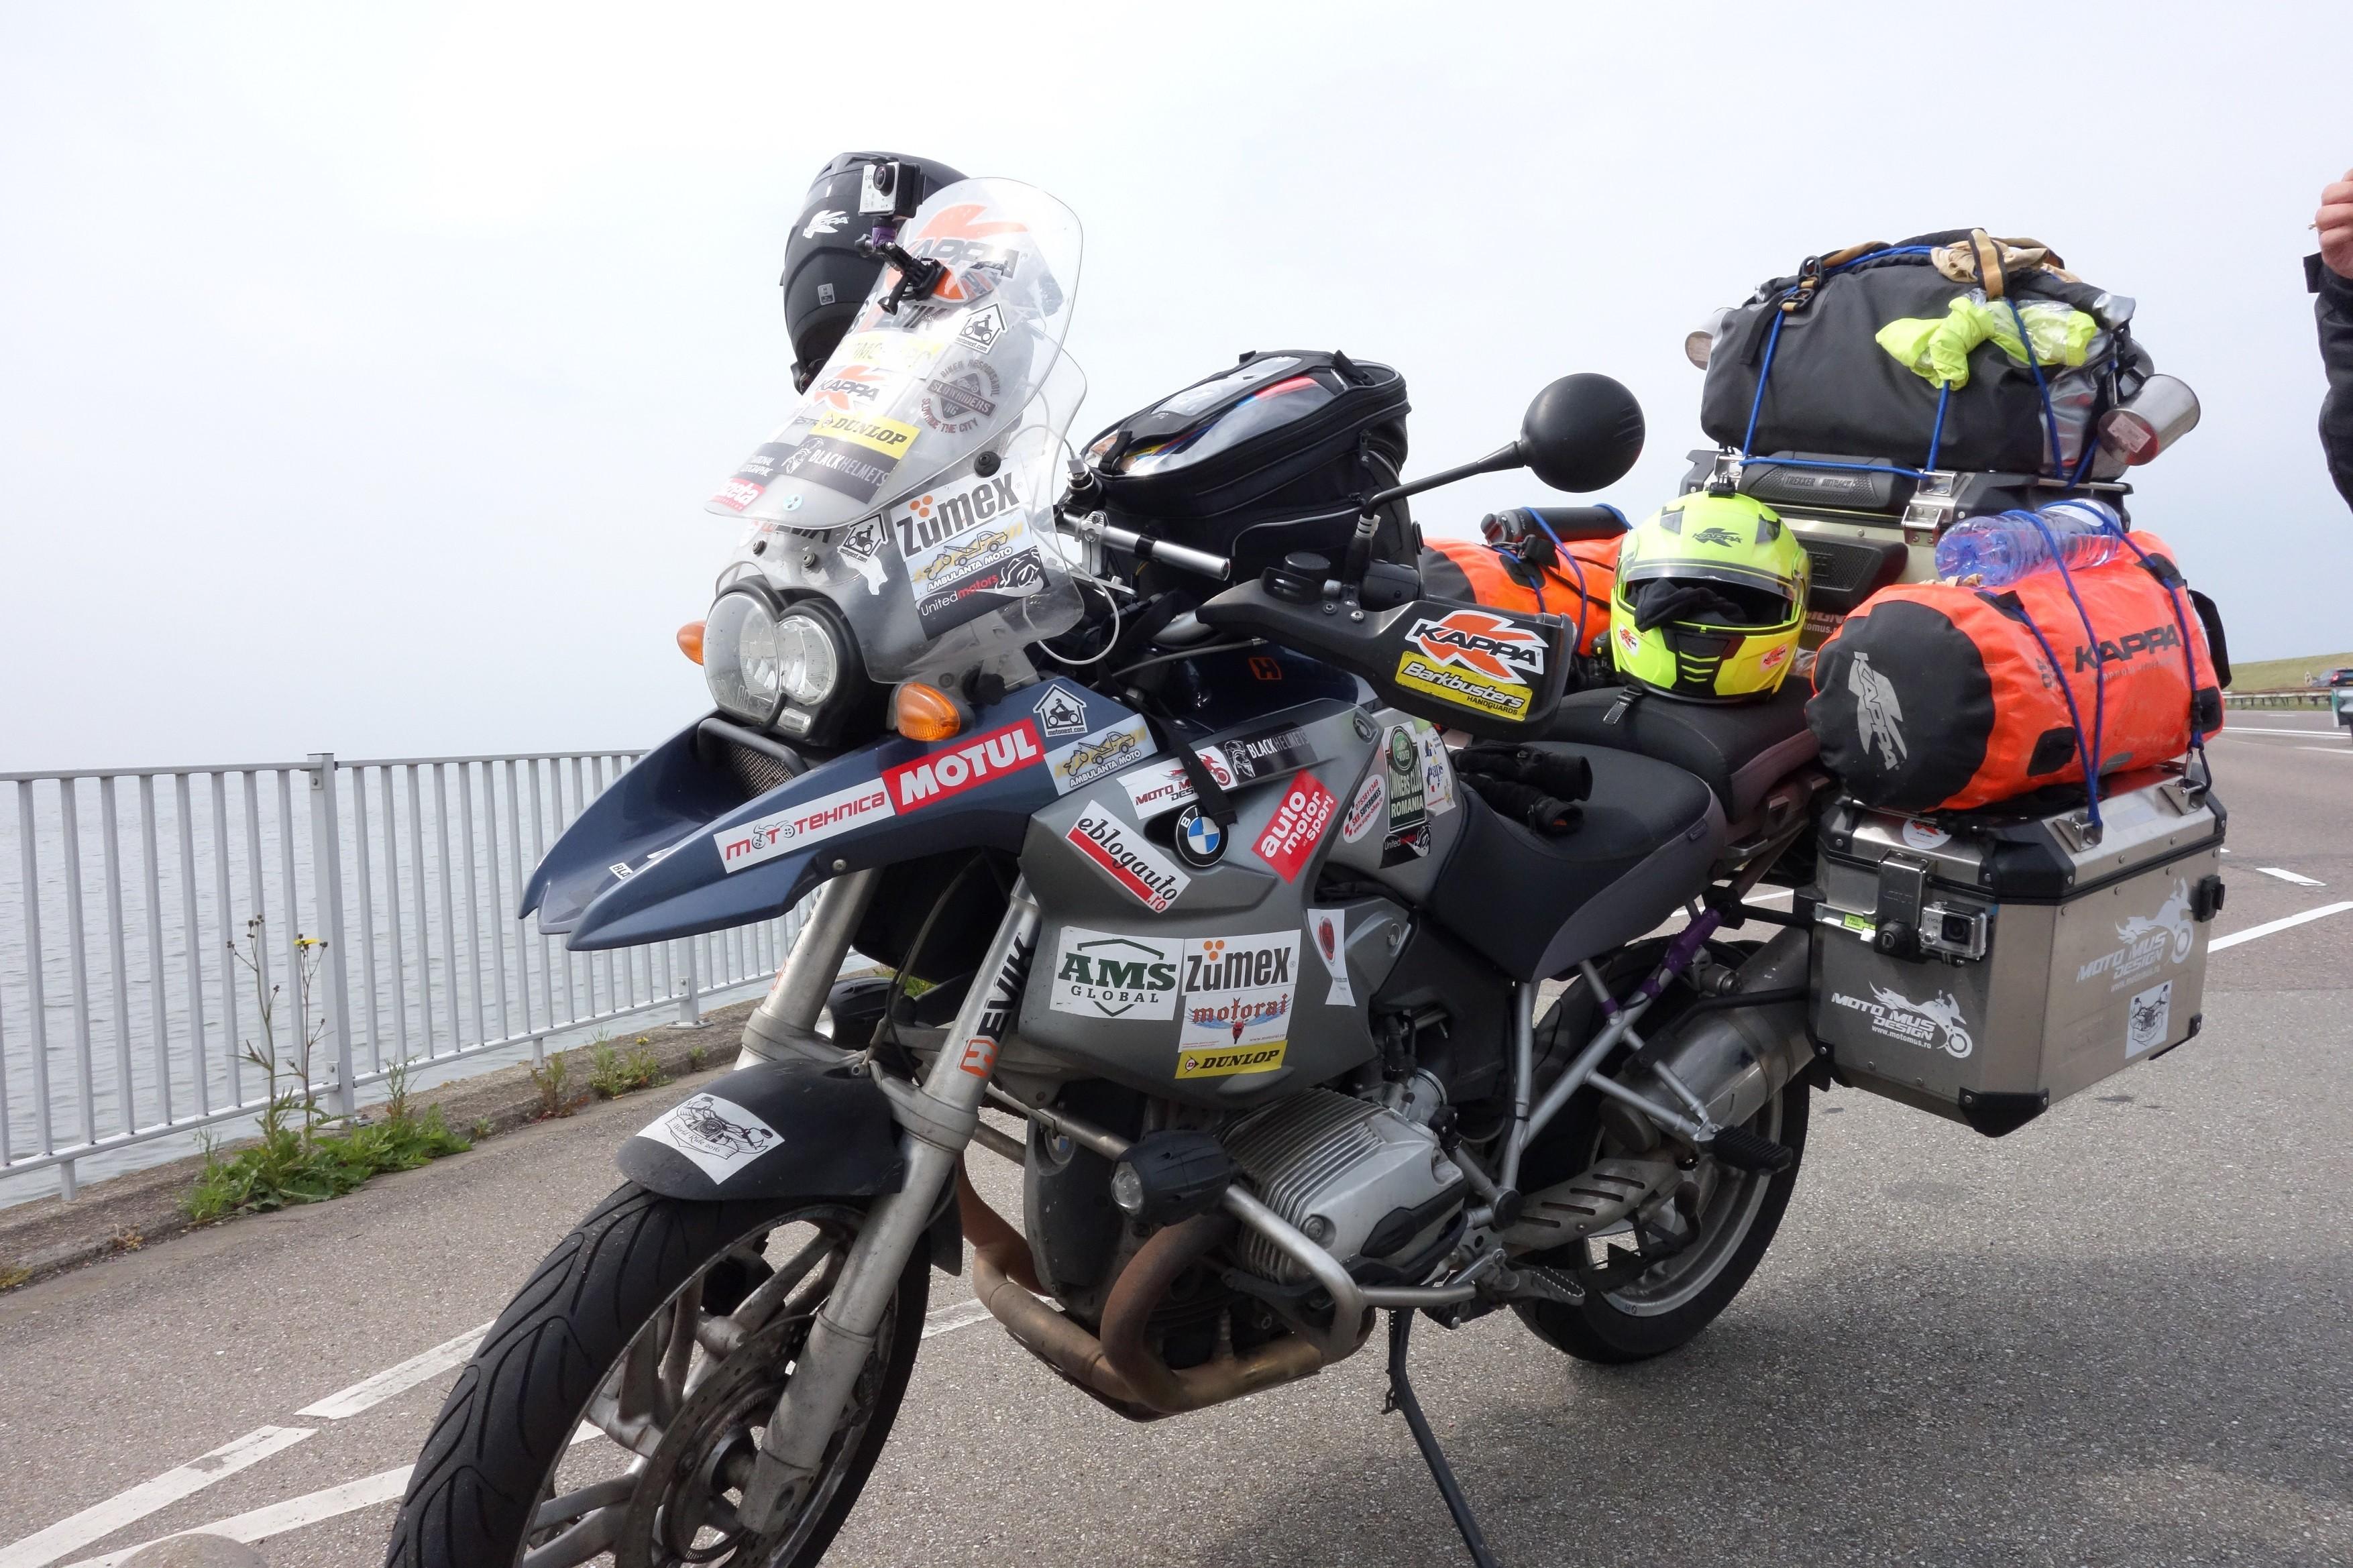 bmw r1200gs riders manual 2005